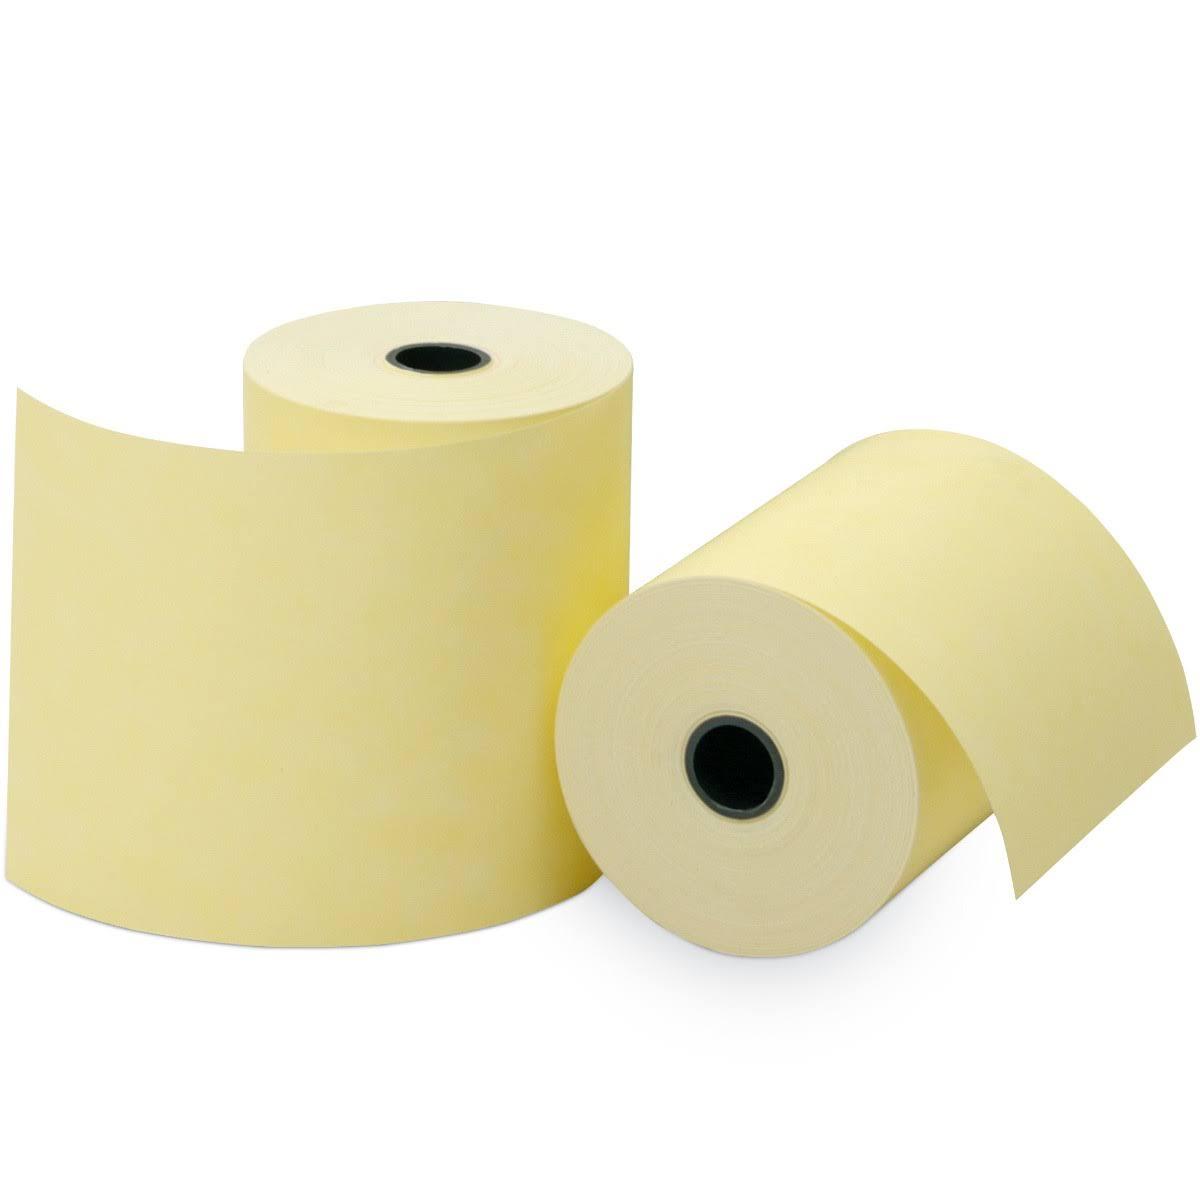 Bobina Térmica Amarela 80 x 40 Ecf Sat Pdv Cupom Caixa 90